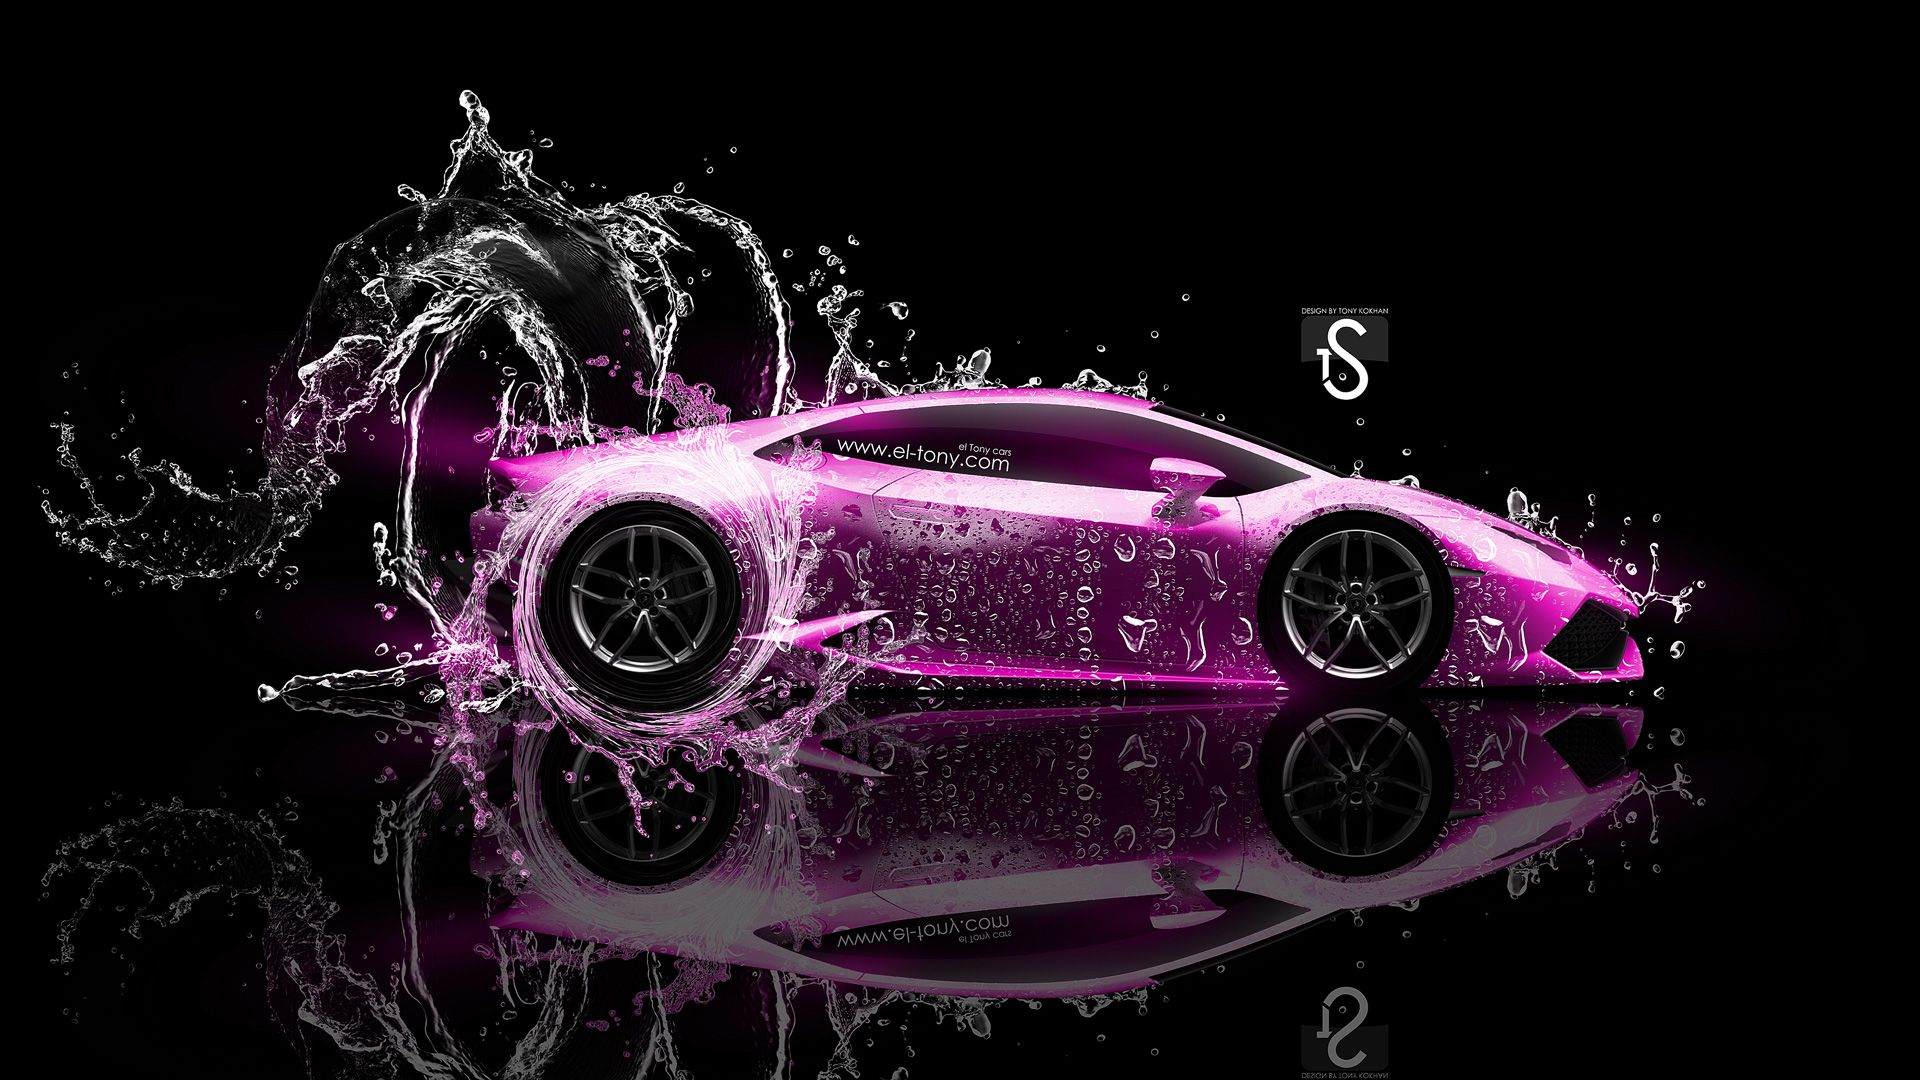 Lamborghini Huracan Tuning Front Water Car 2014   Lamborghini Huracan Fantasy  Plastic Bull Car Huracan Tuning Front Crystal City Car IPhone X Back Logo  ...